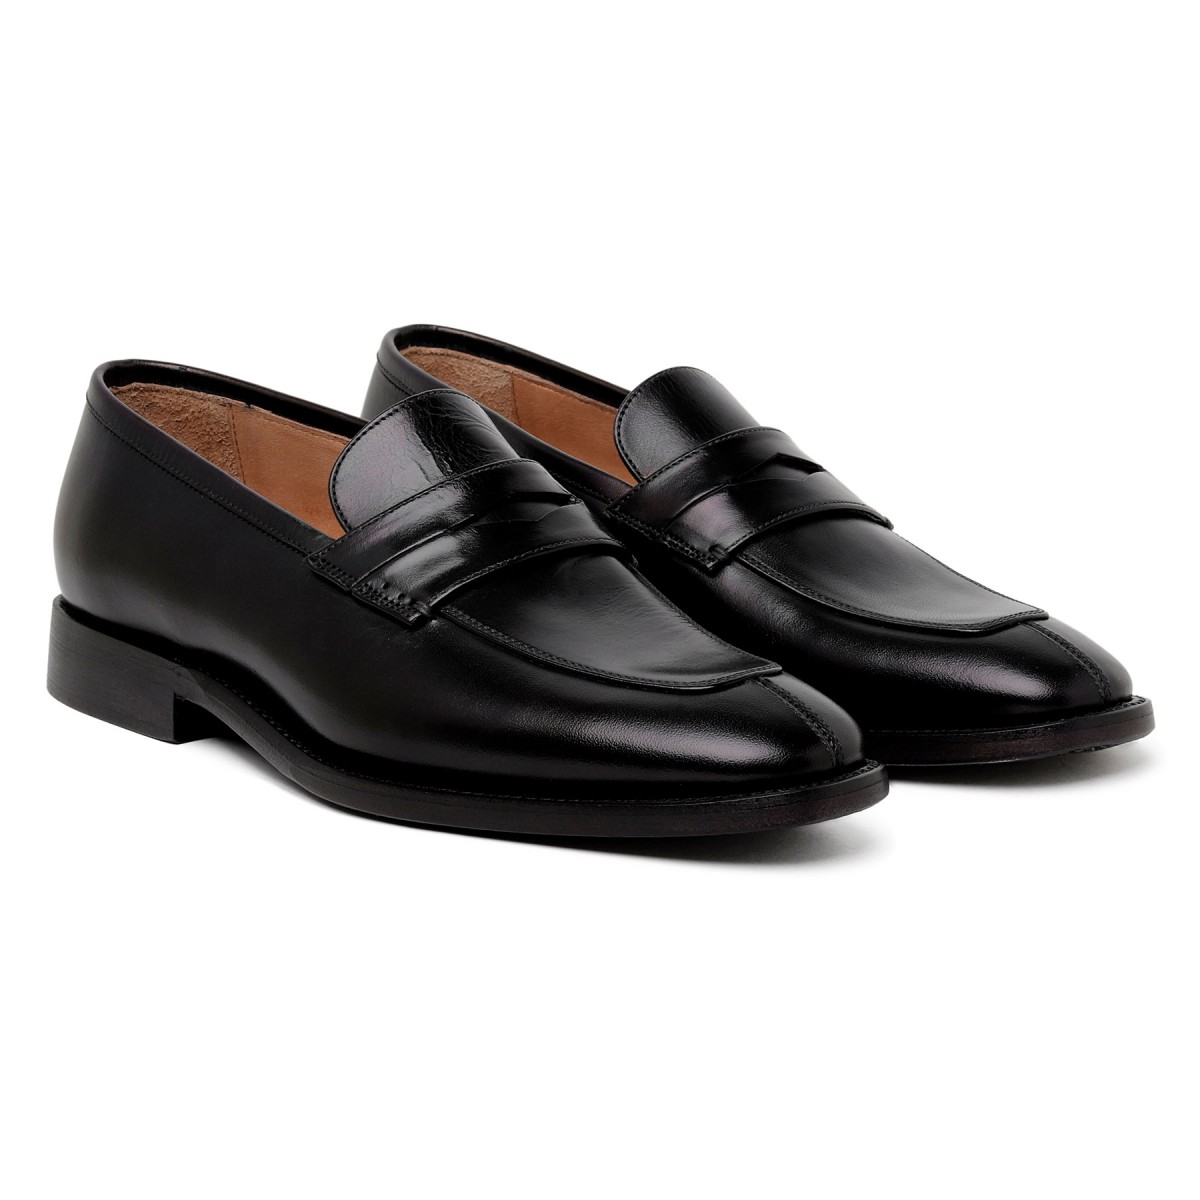 Marsiglia black leather loafers